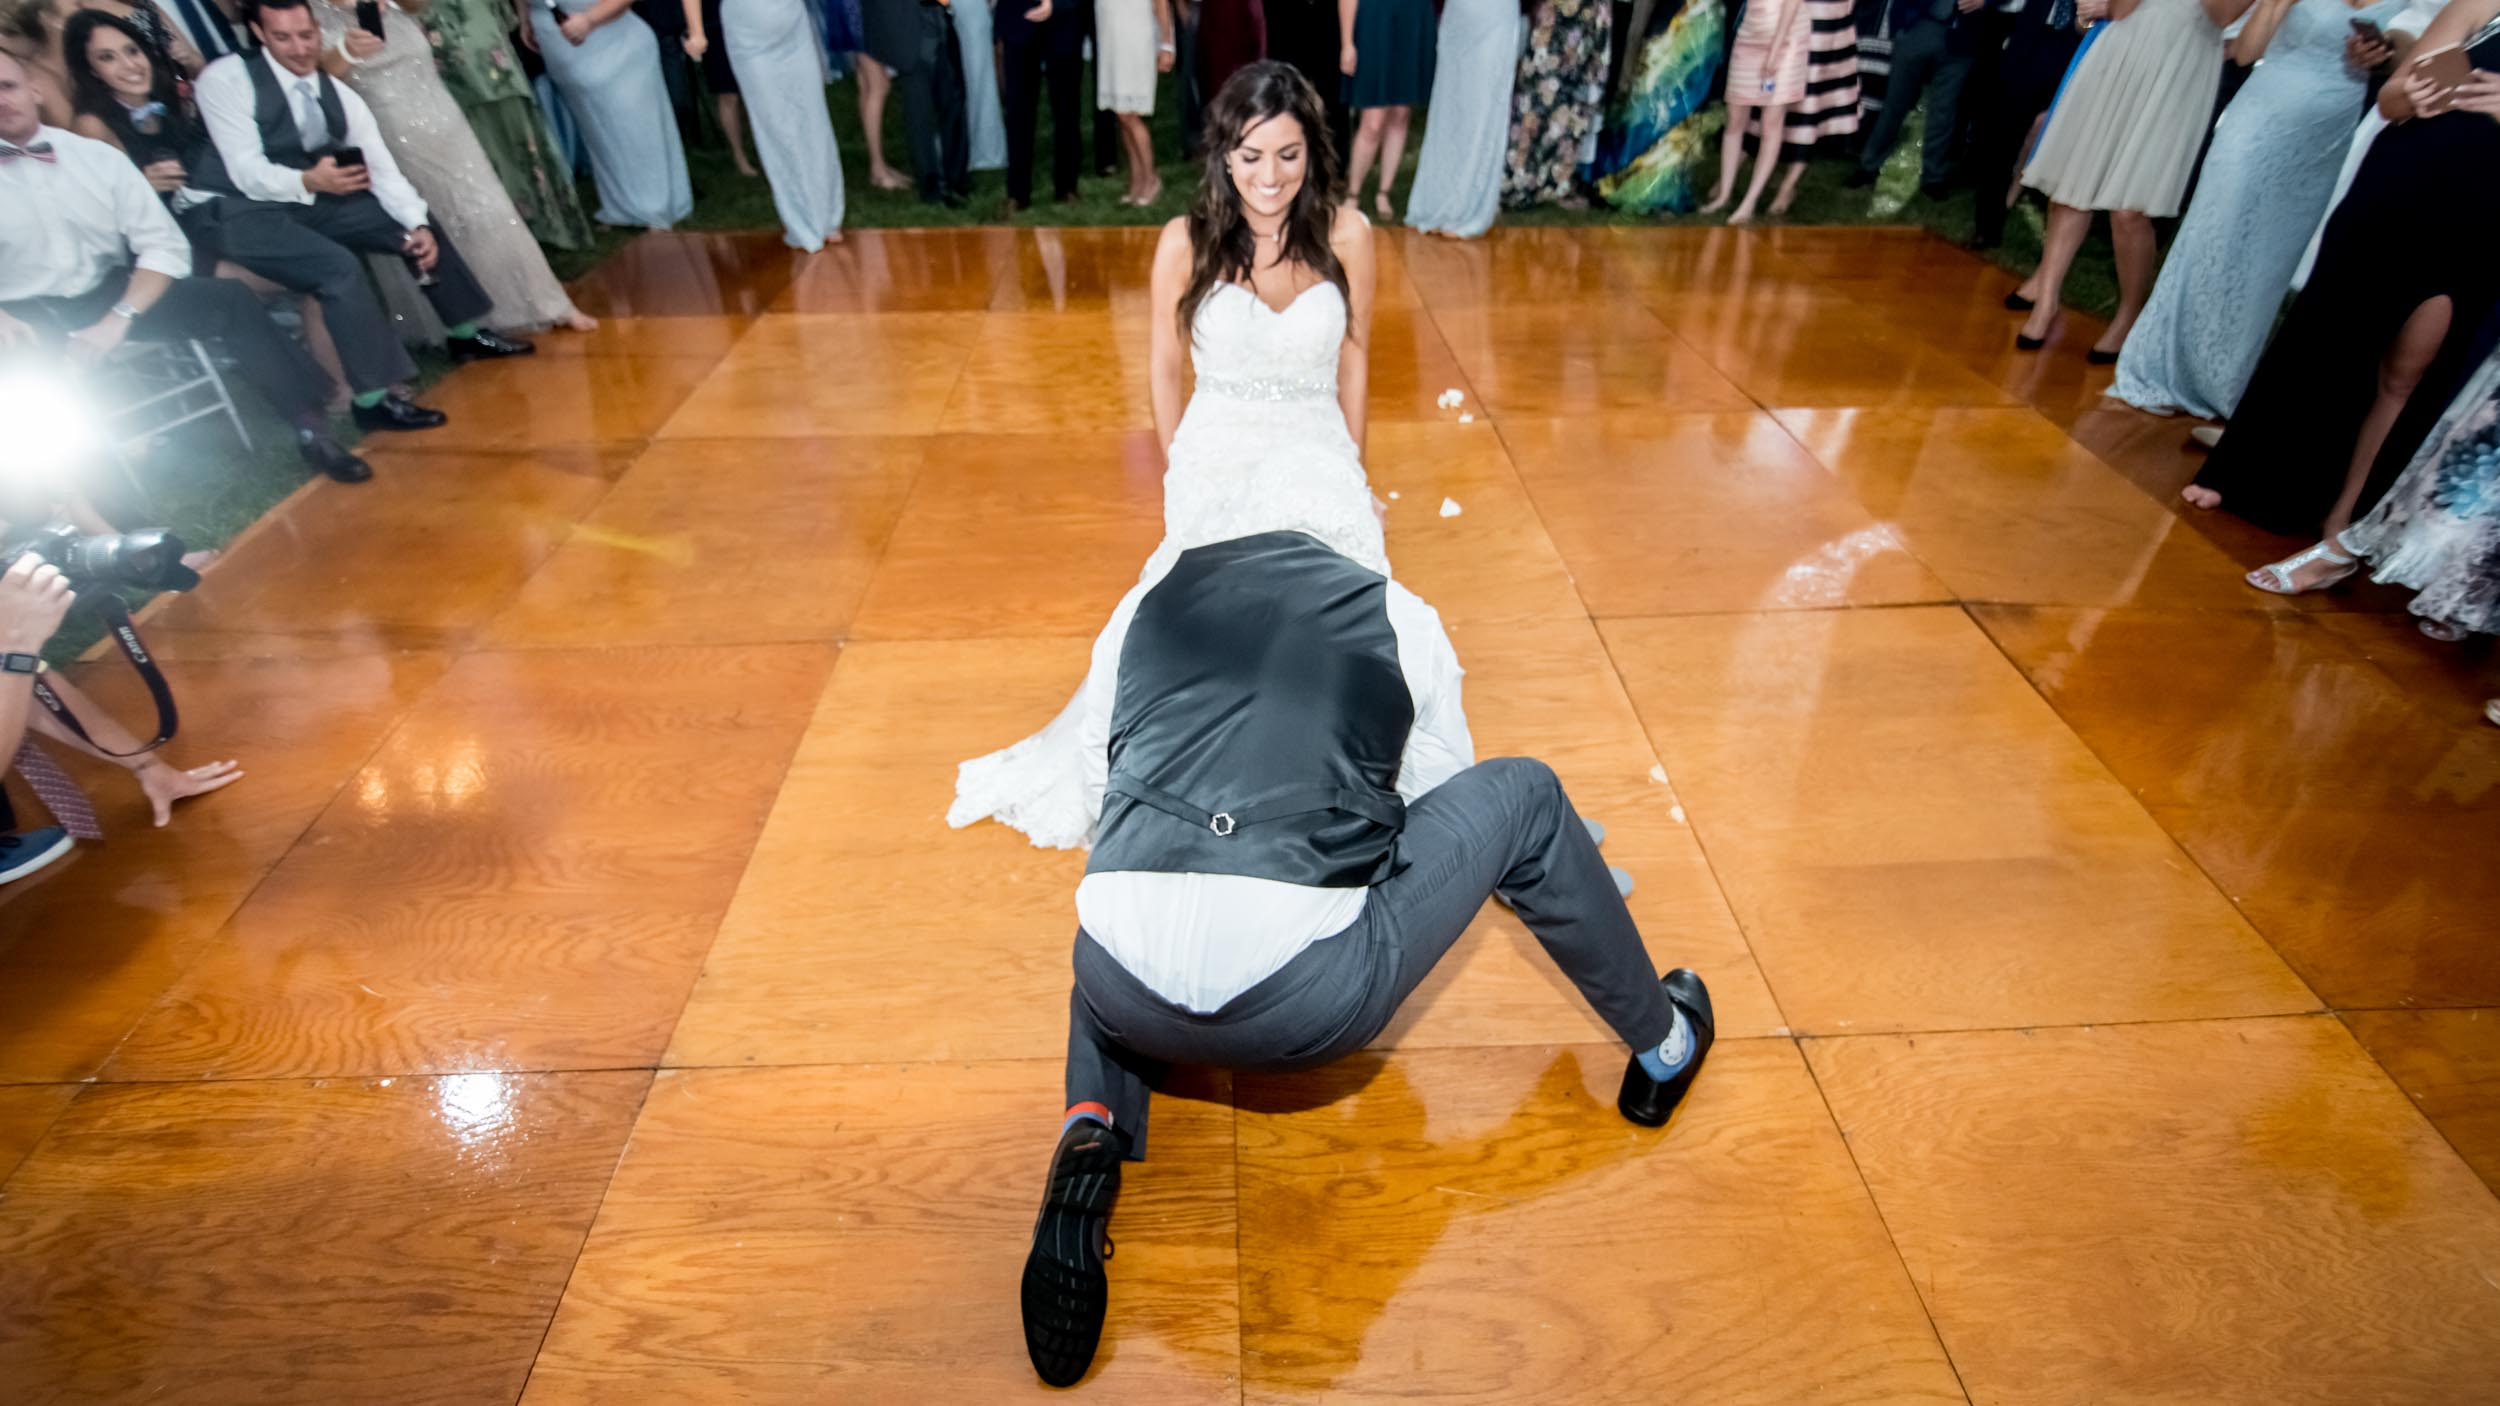 dc+metro+wedding+photographer+vadym+guliuk+photography+wedding+garter+toss-2023.jpg